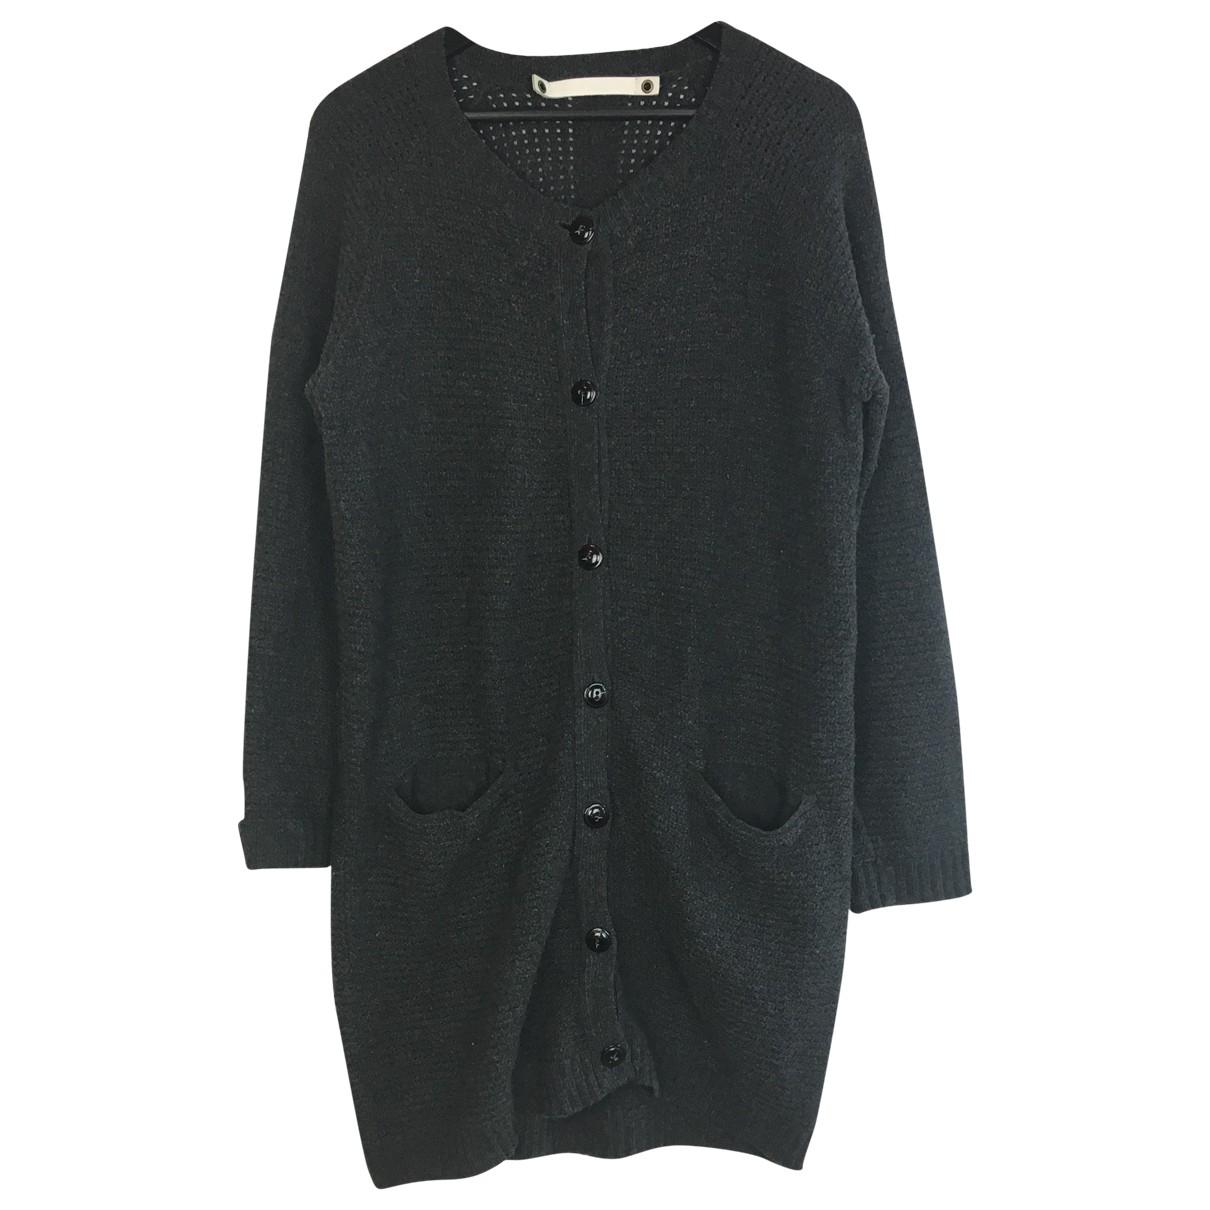 Coat People - Pull   pour femme en laine - anthracite